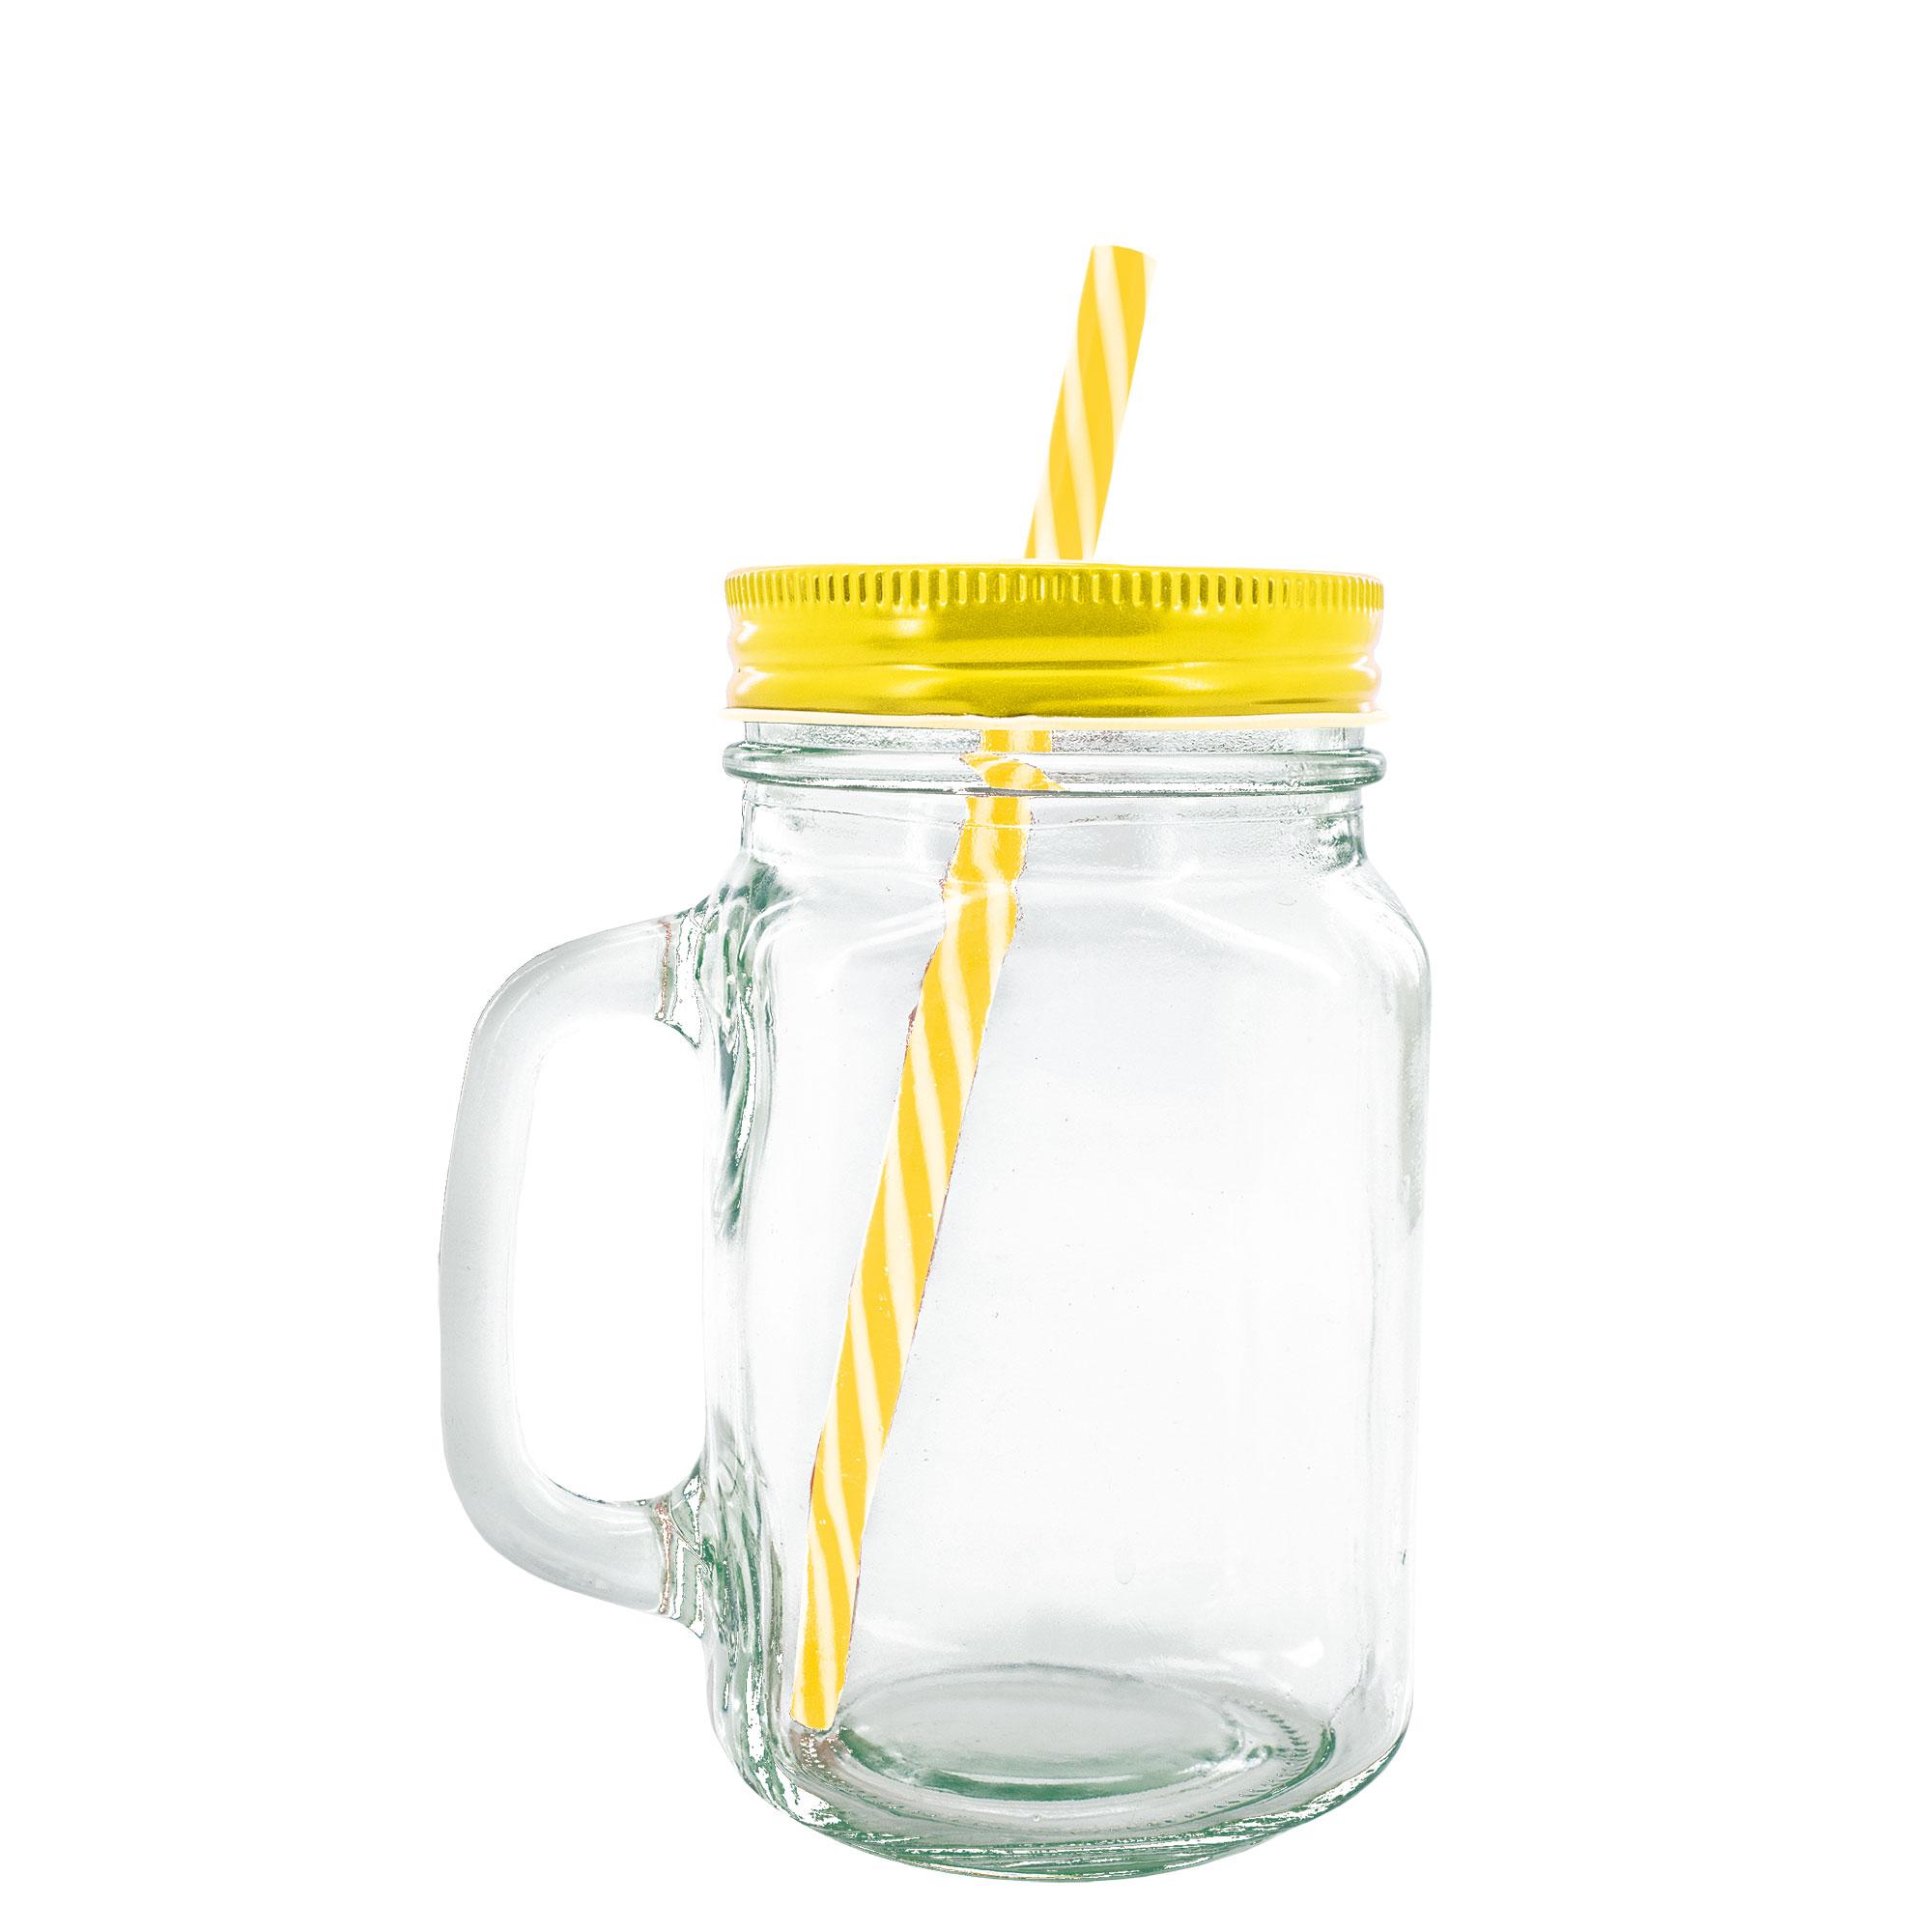 TRASPARENT GLASS JAR CHUR